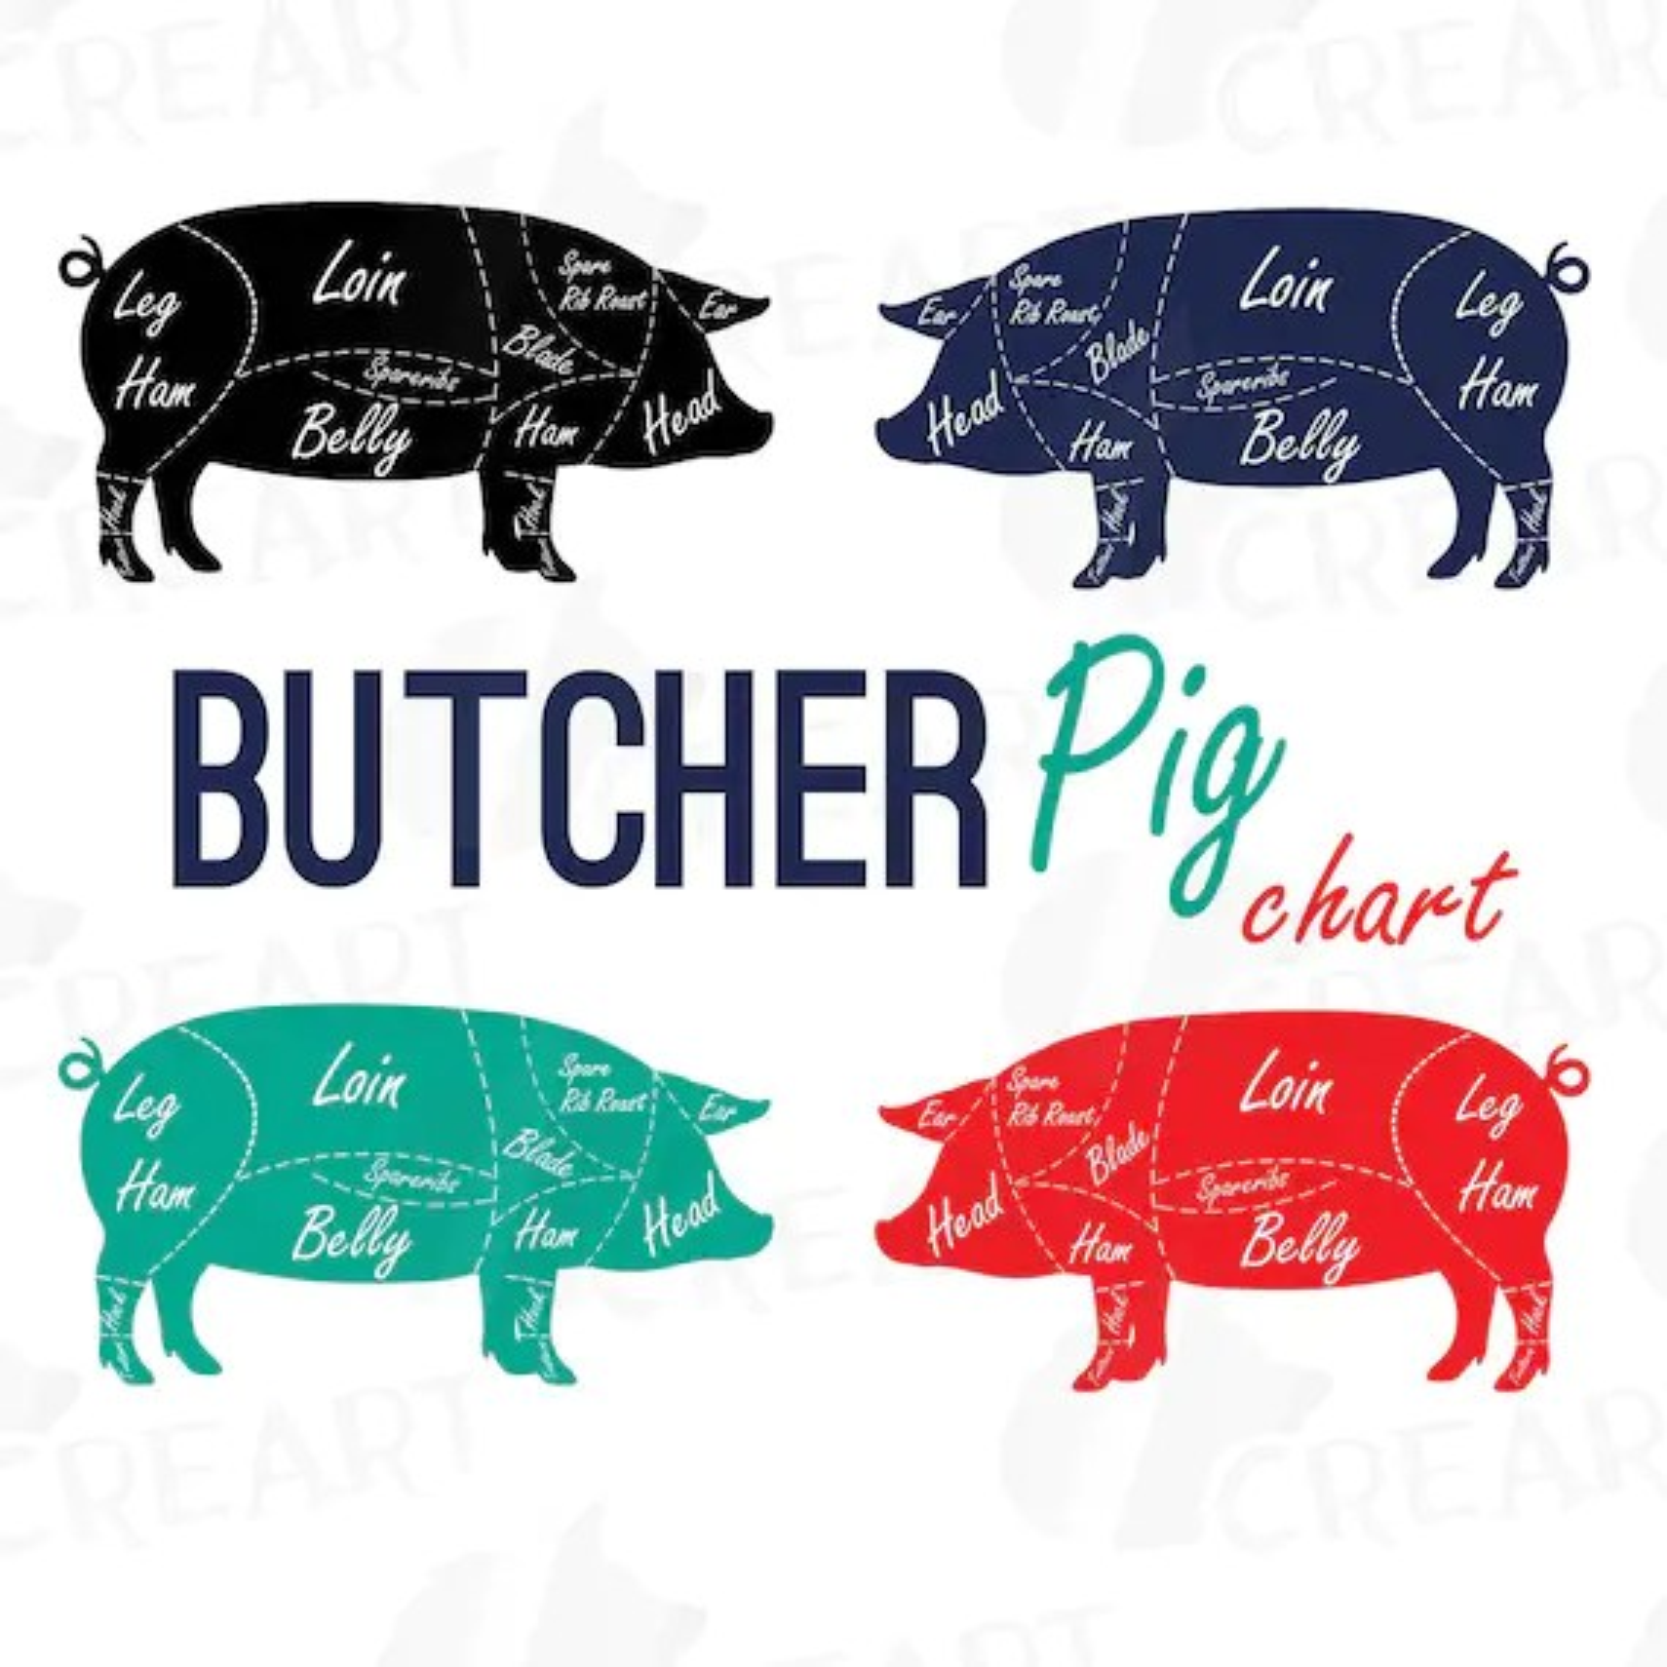 pig cuts diagram lpg changeover switch wiring butcher clip art digital chart pork etsy image 0